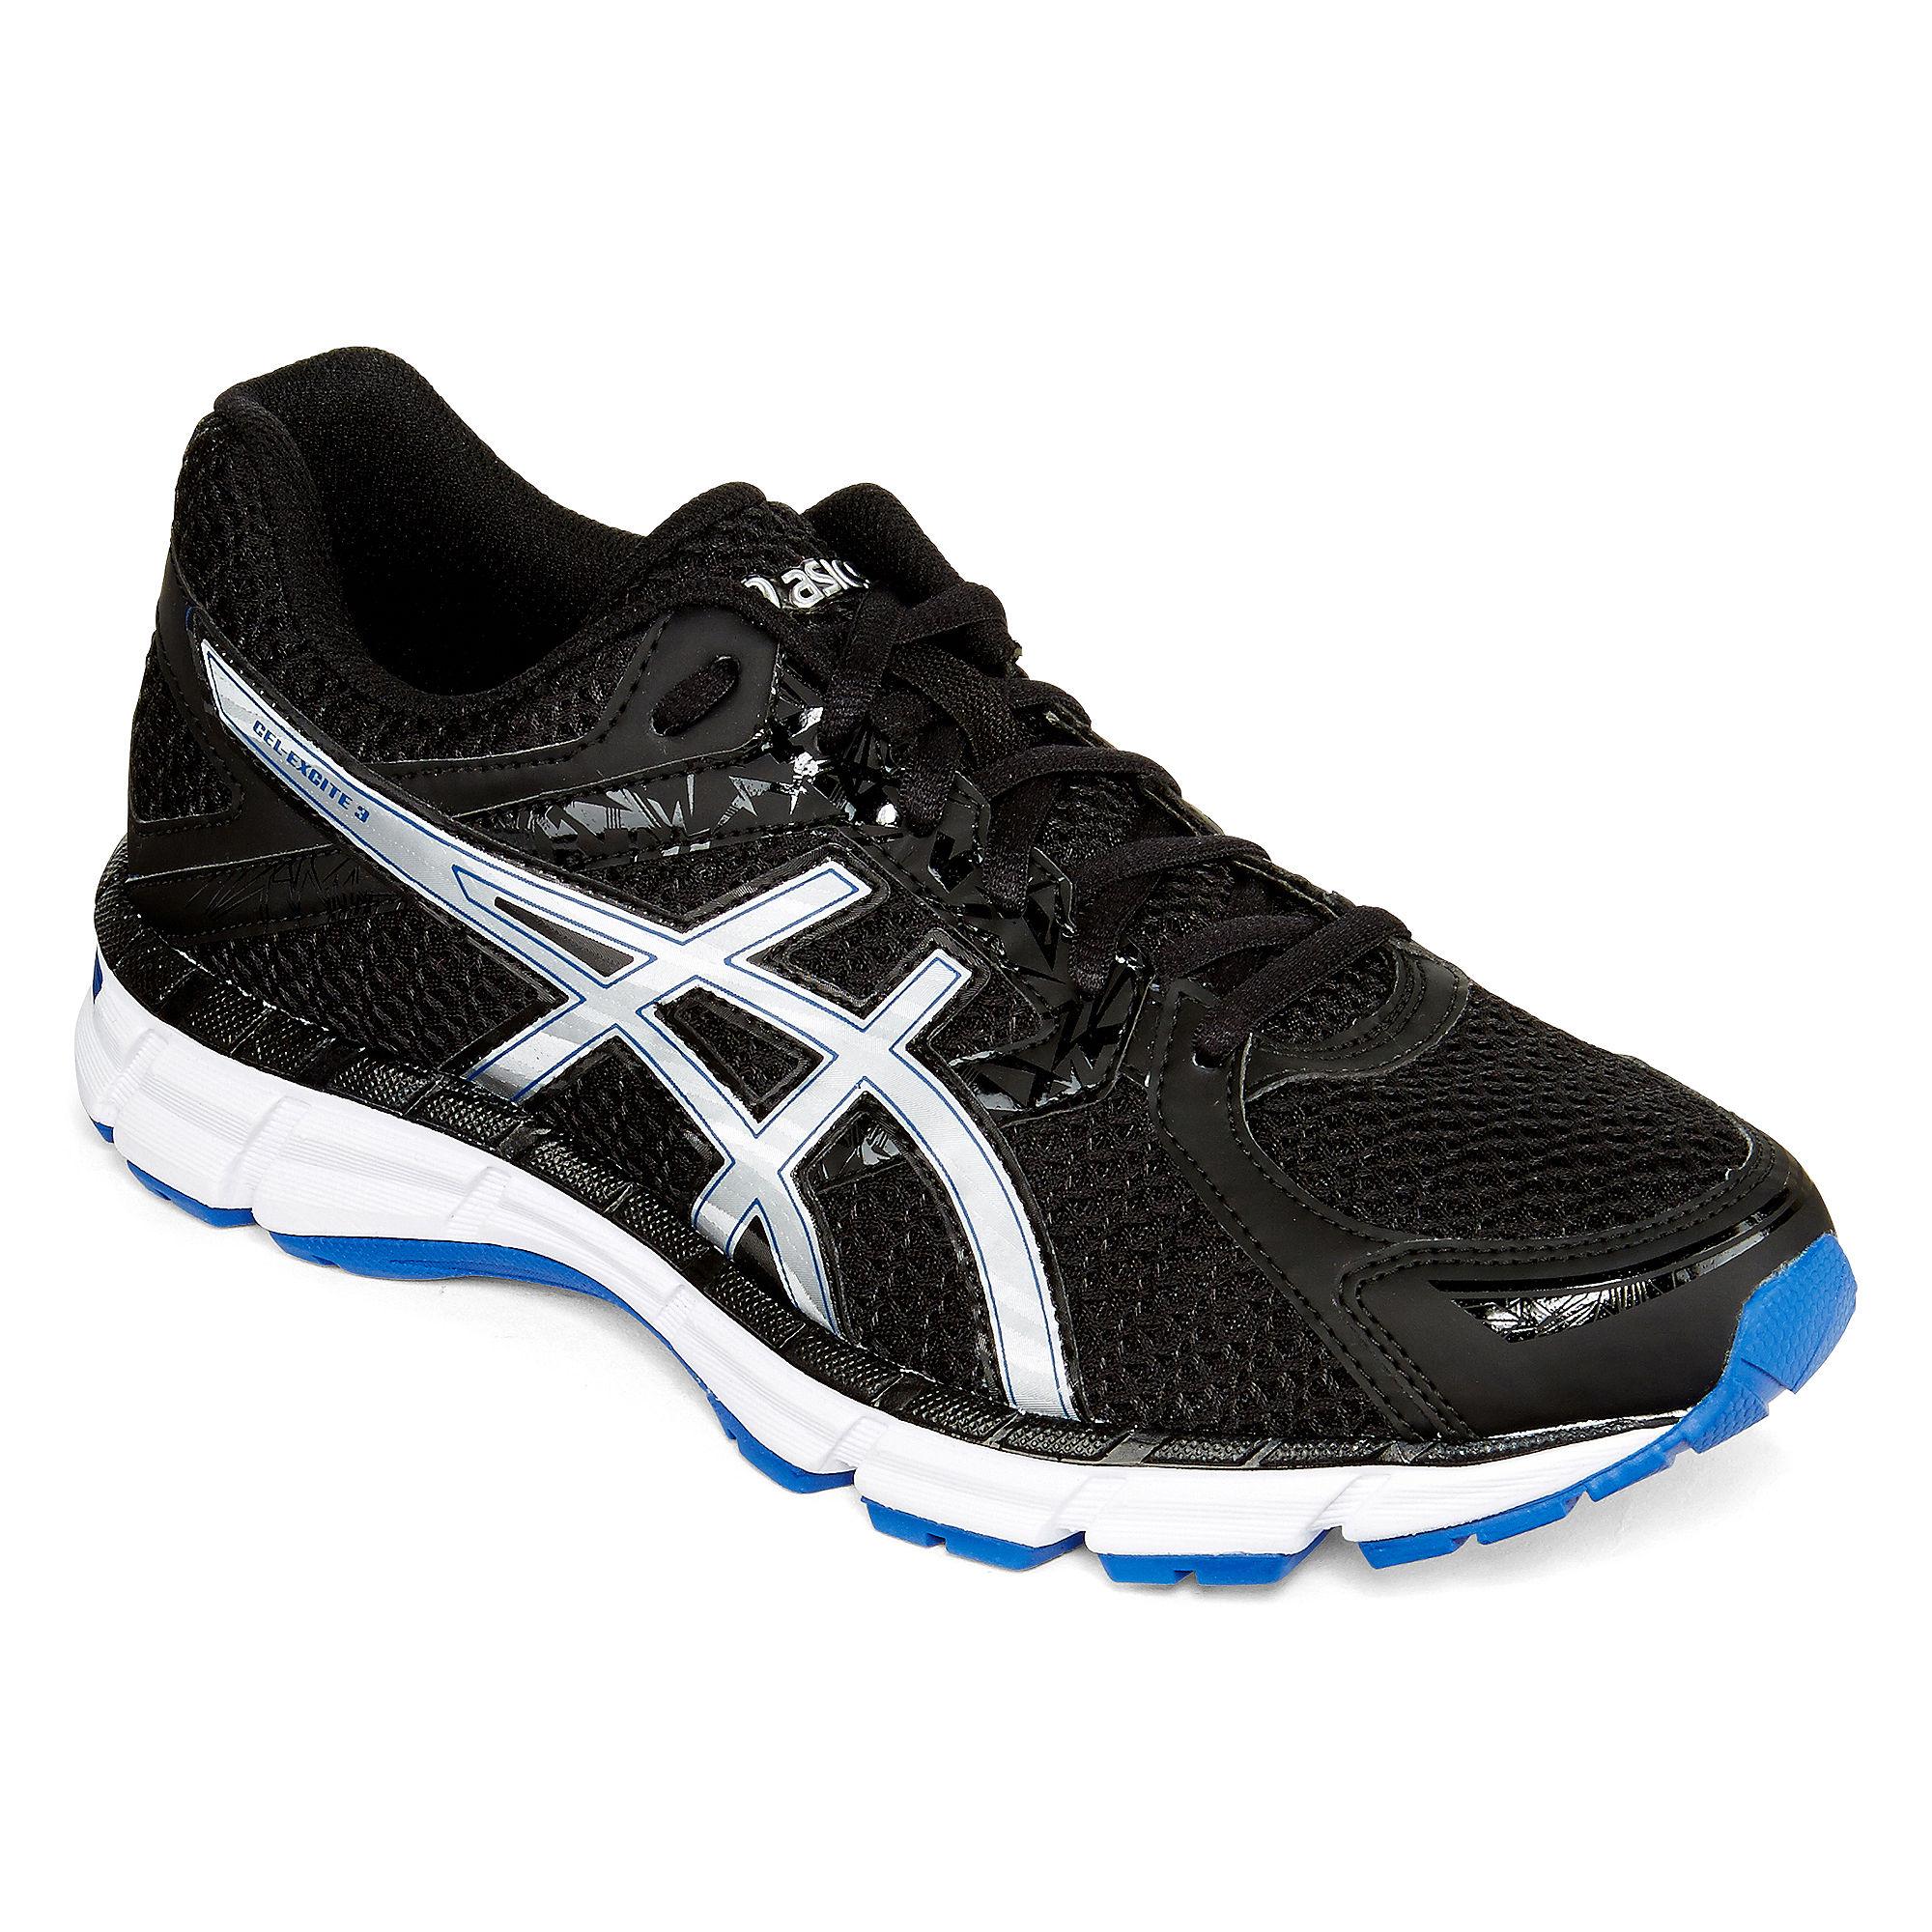 Asics Men s Gel Excite 3 Running Shoe